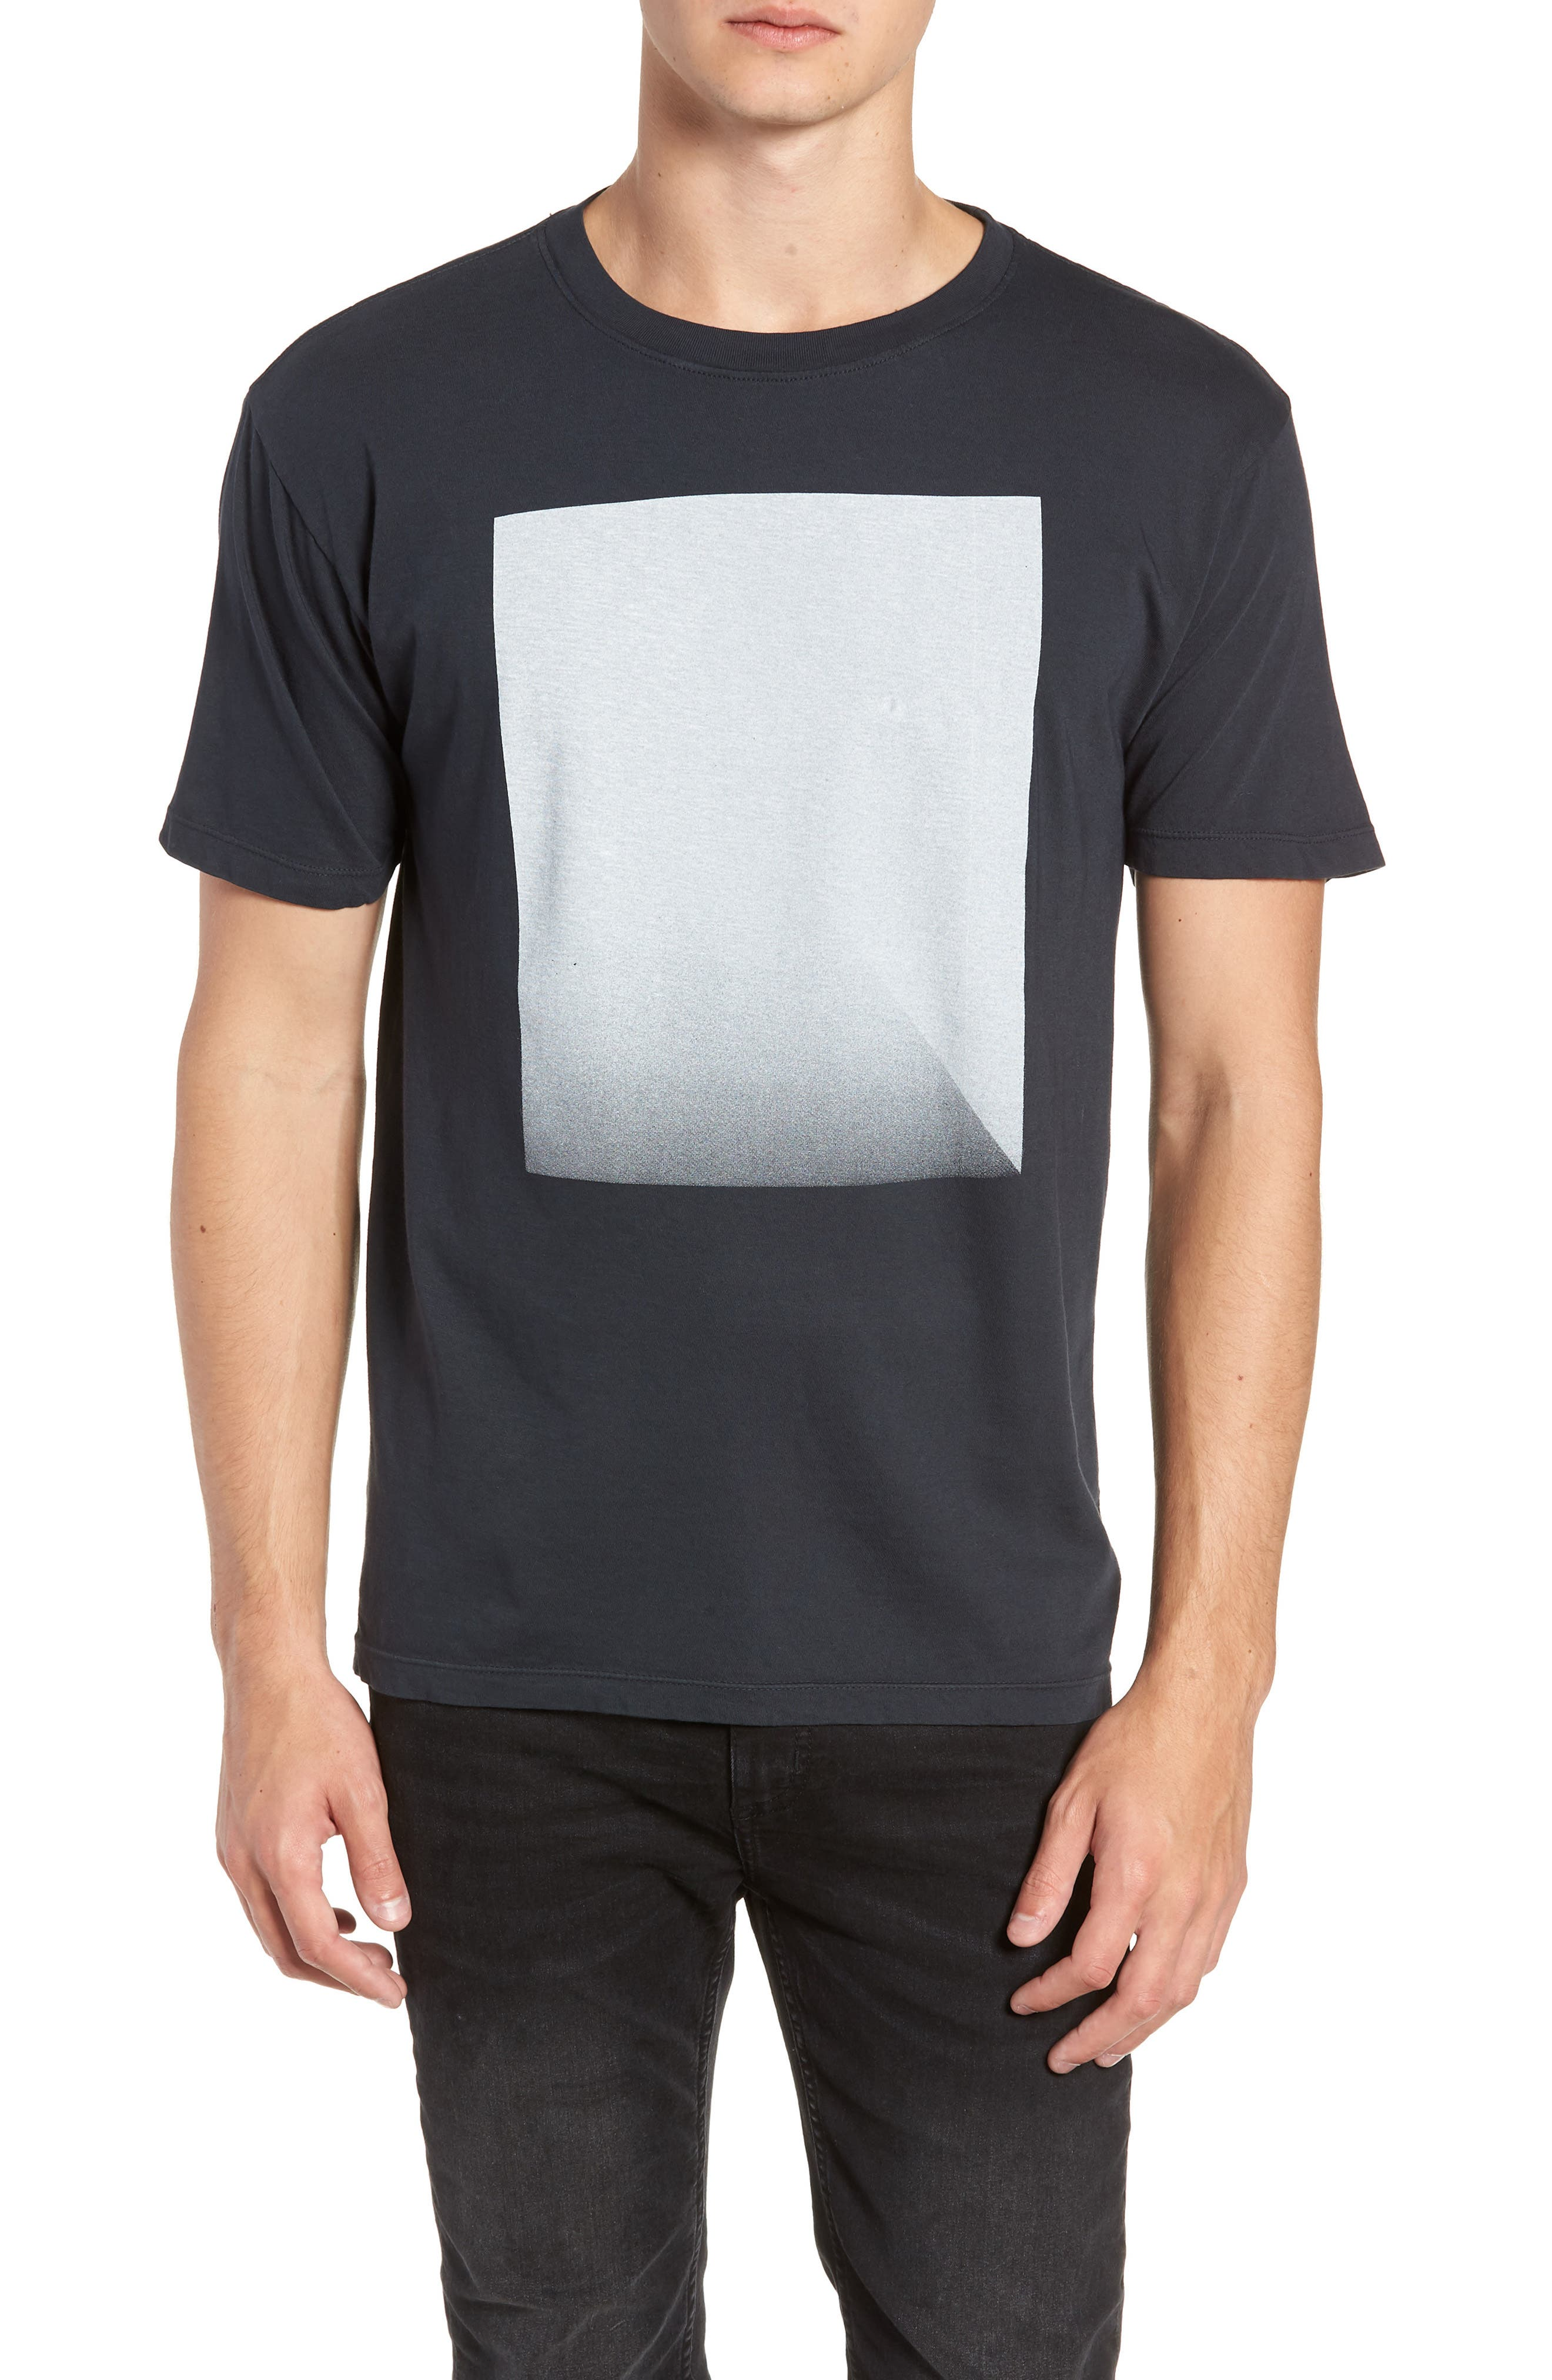 VESTIGE Fadeaway Graphic T-Shirt in Carbon